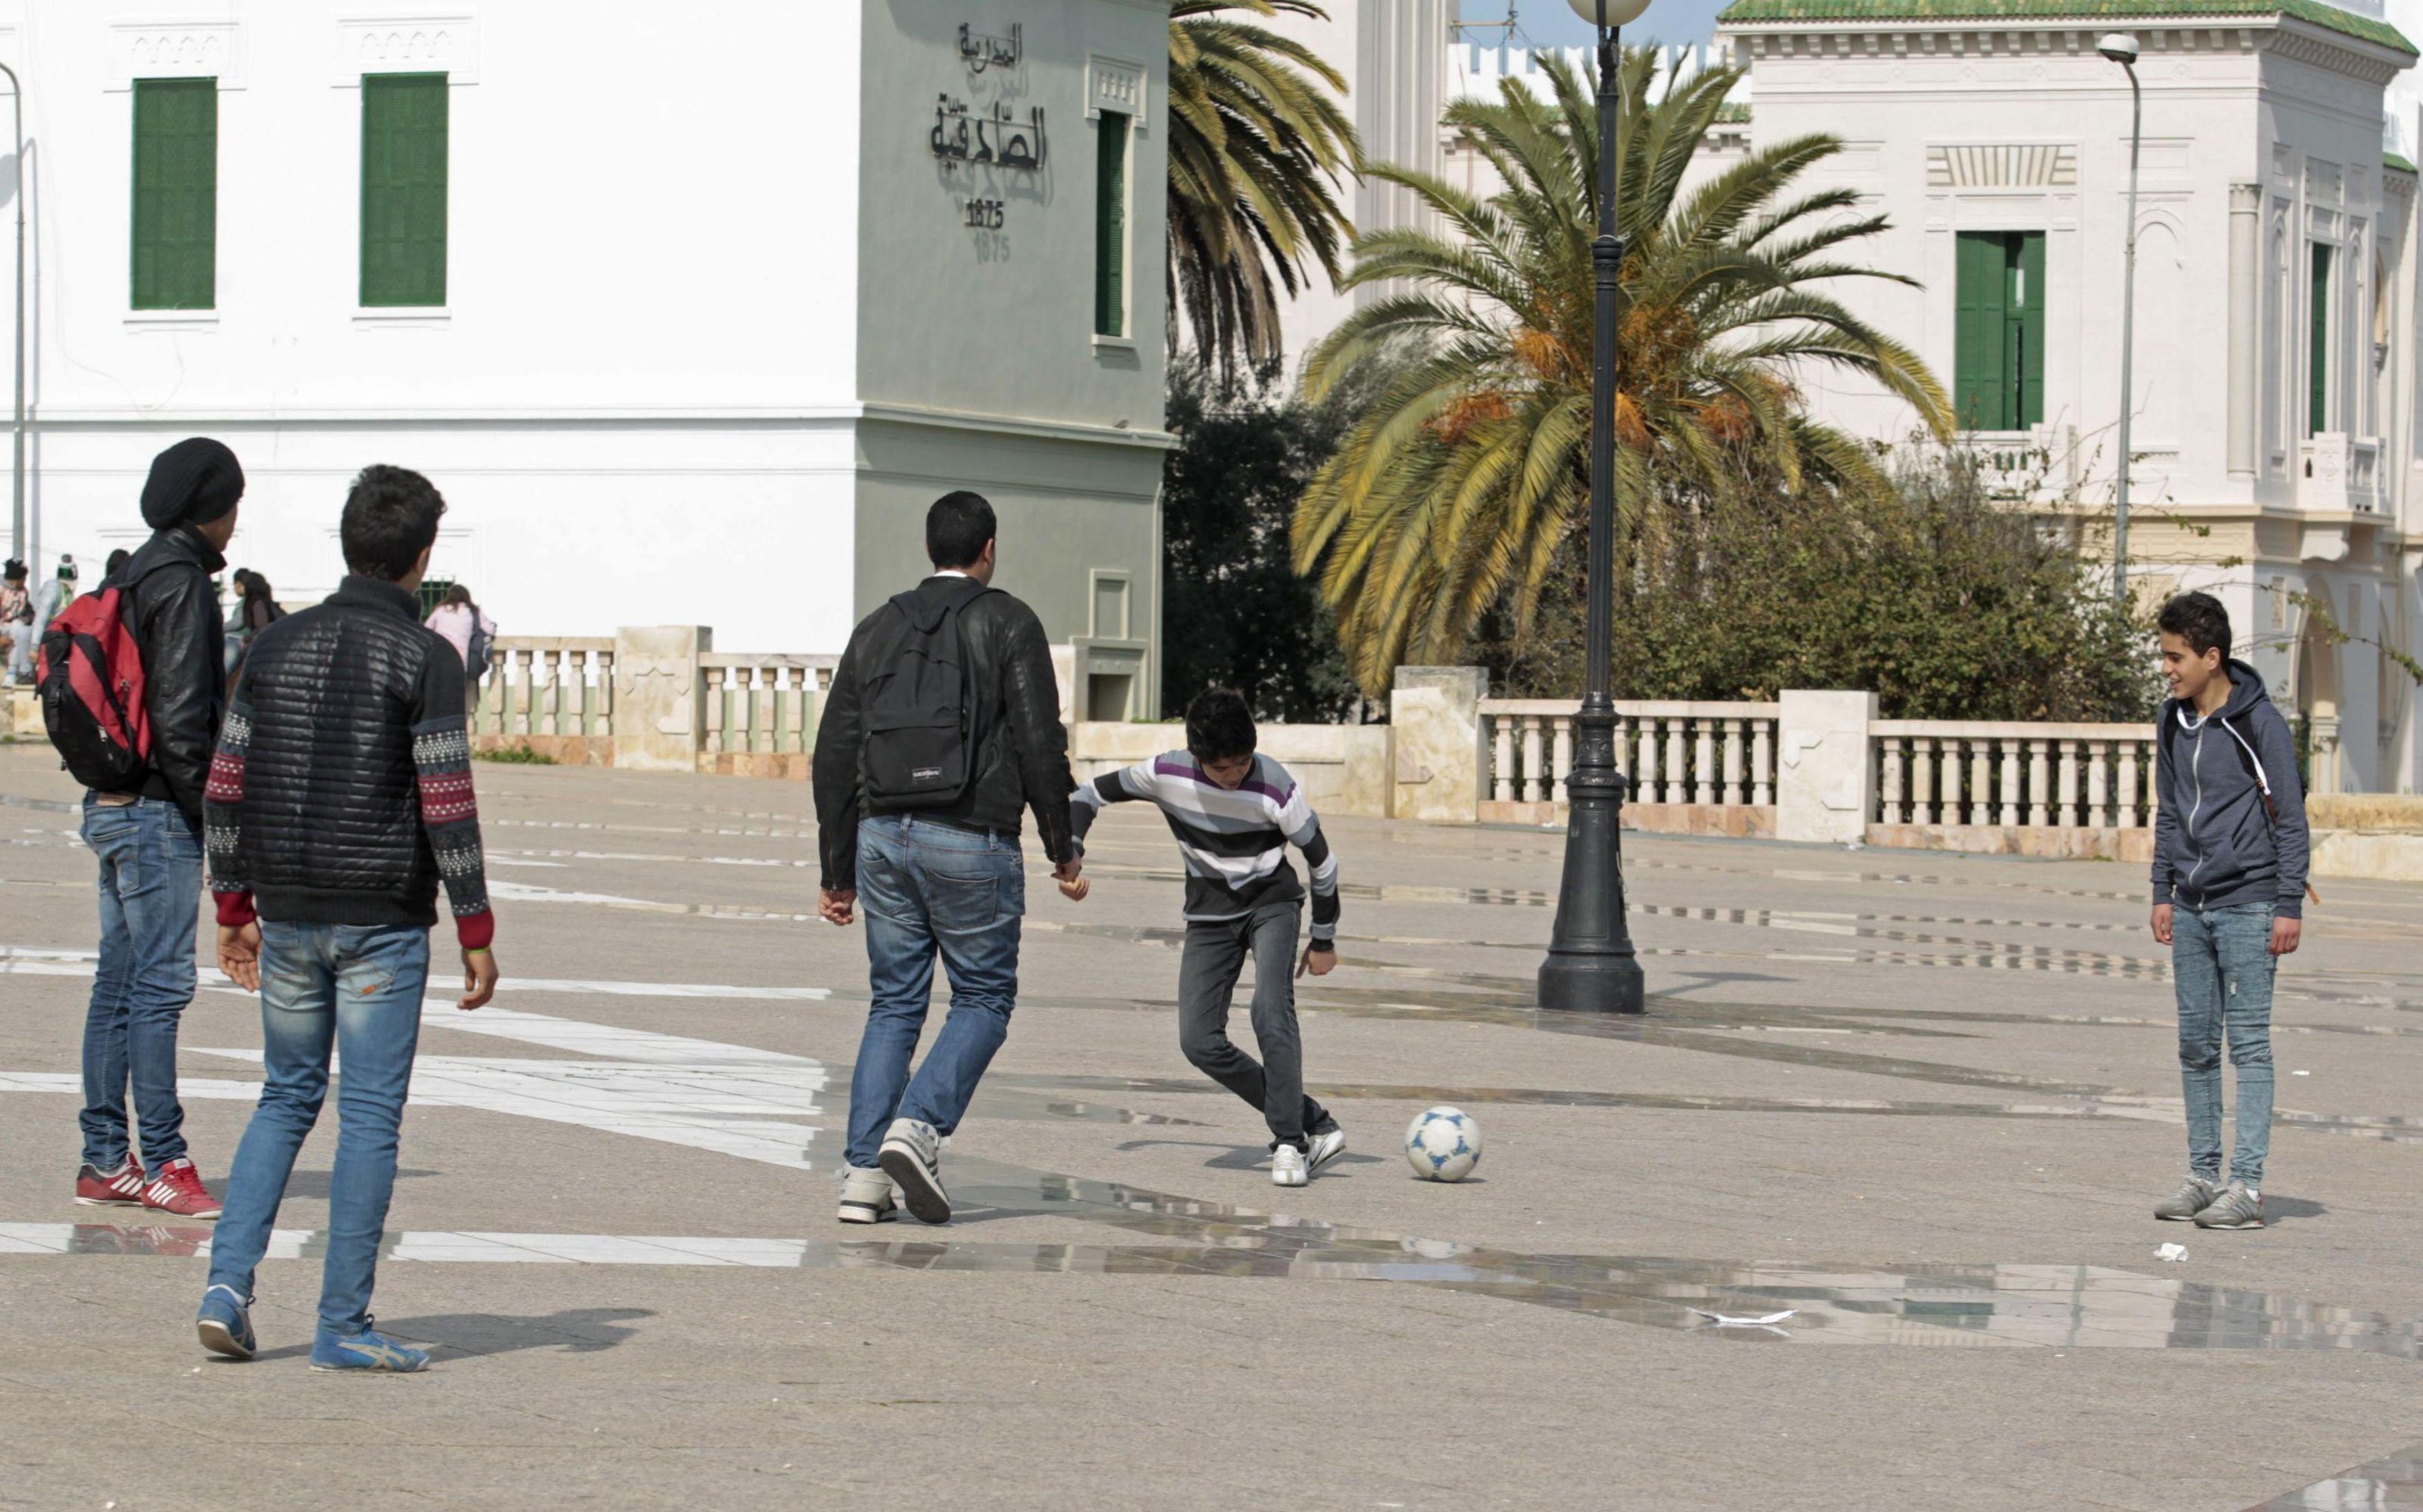 20150302131442reup--2015-03-02t131312z_2048448057_gm1eb321muf01_rtrmadp_3_tunisia-reform.h